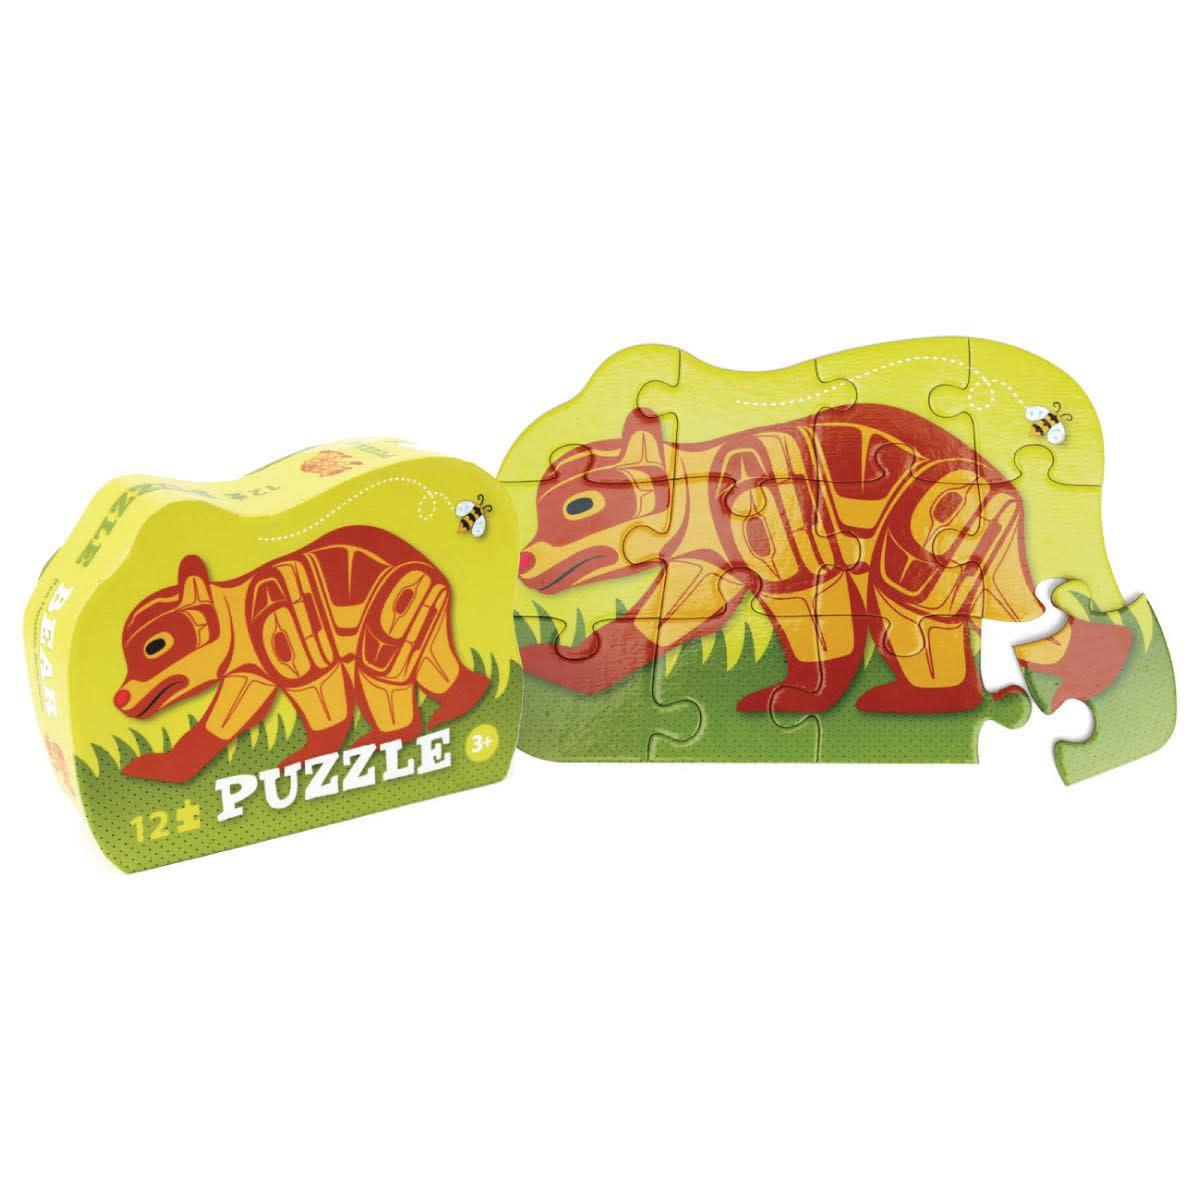 12 Piece Puzzle-Bear by Ben Houstie-1